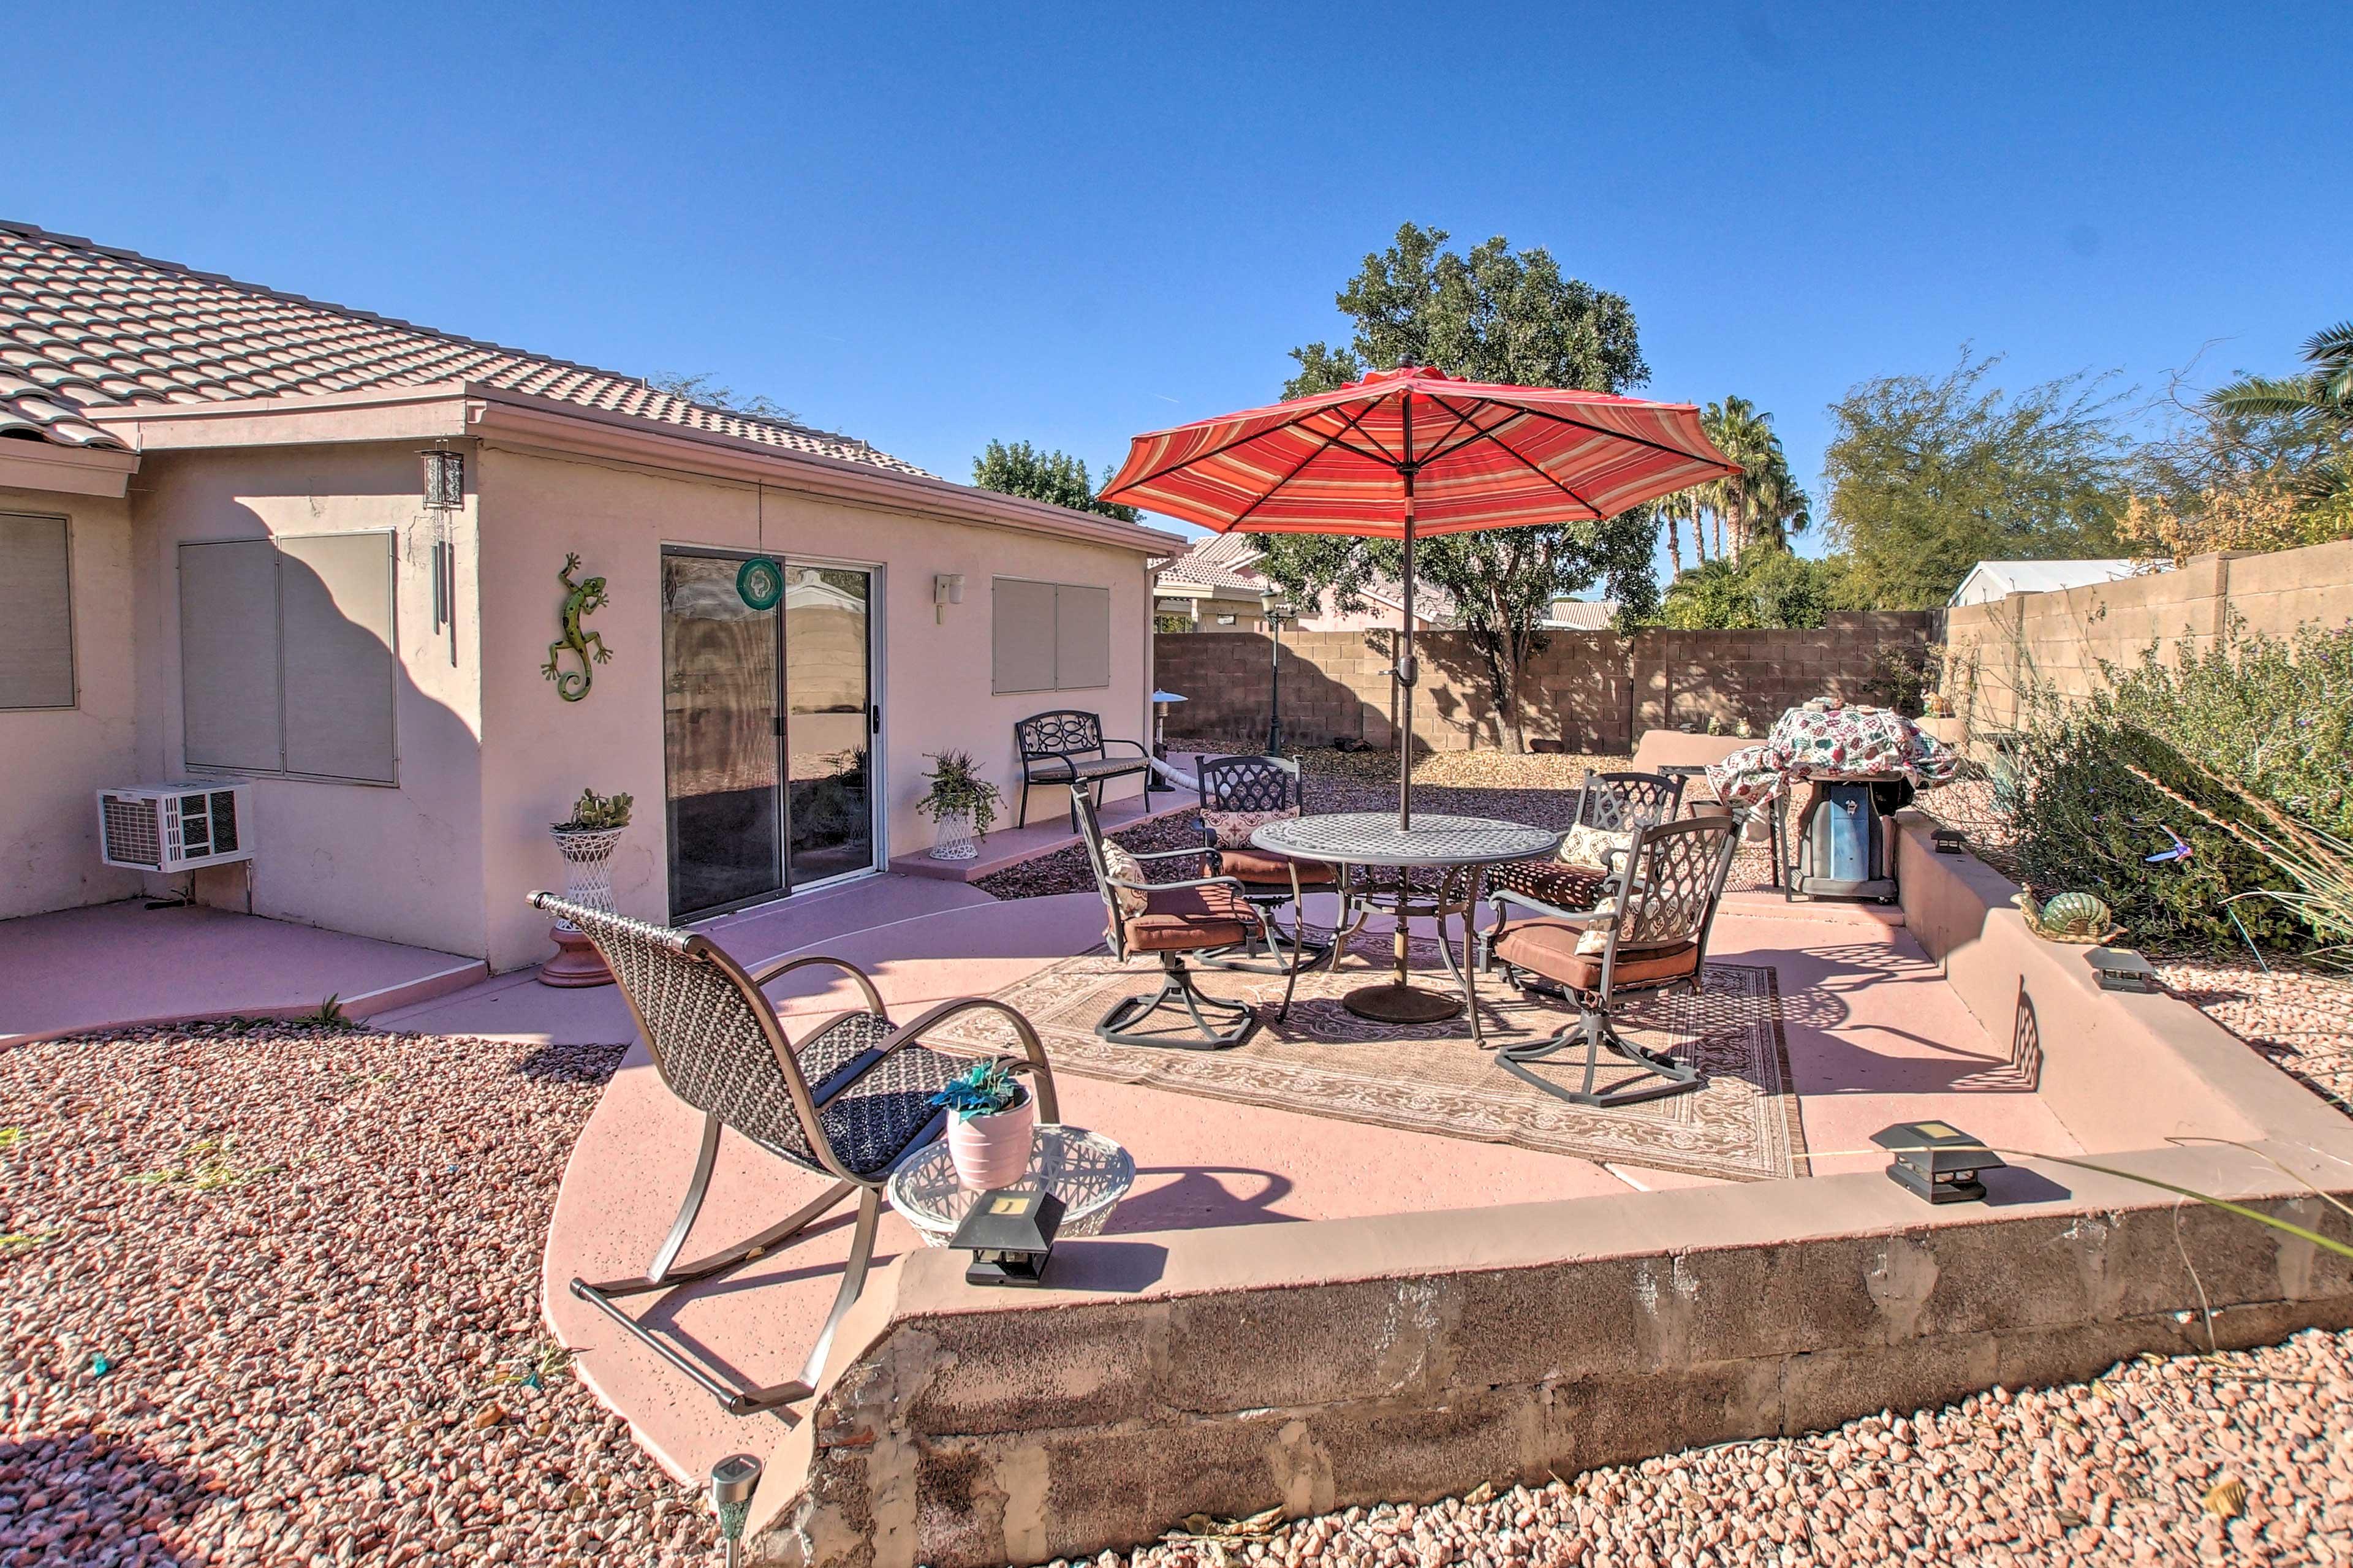 Phoenix Vacation Rental Home   3BR   2BA   Single Story   1,650 Sq Ft